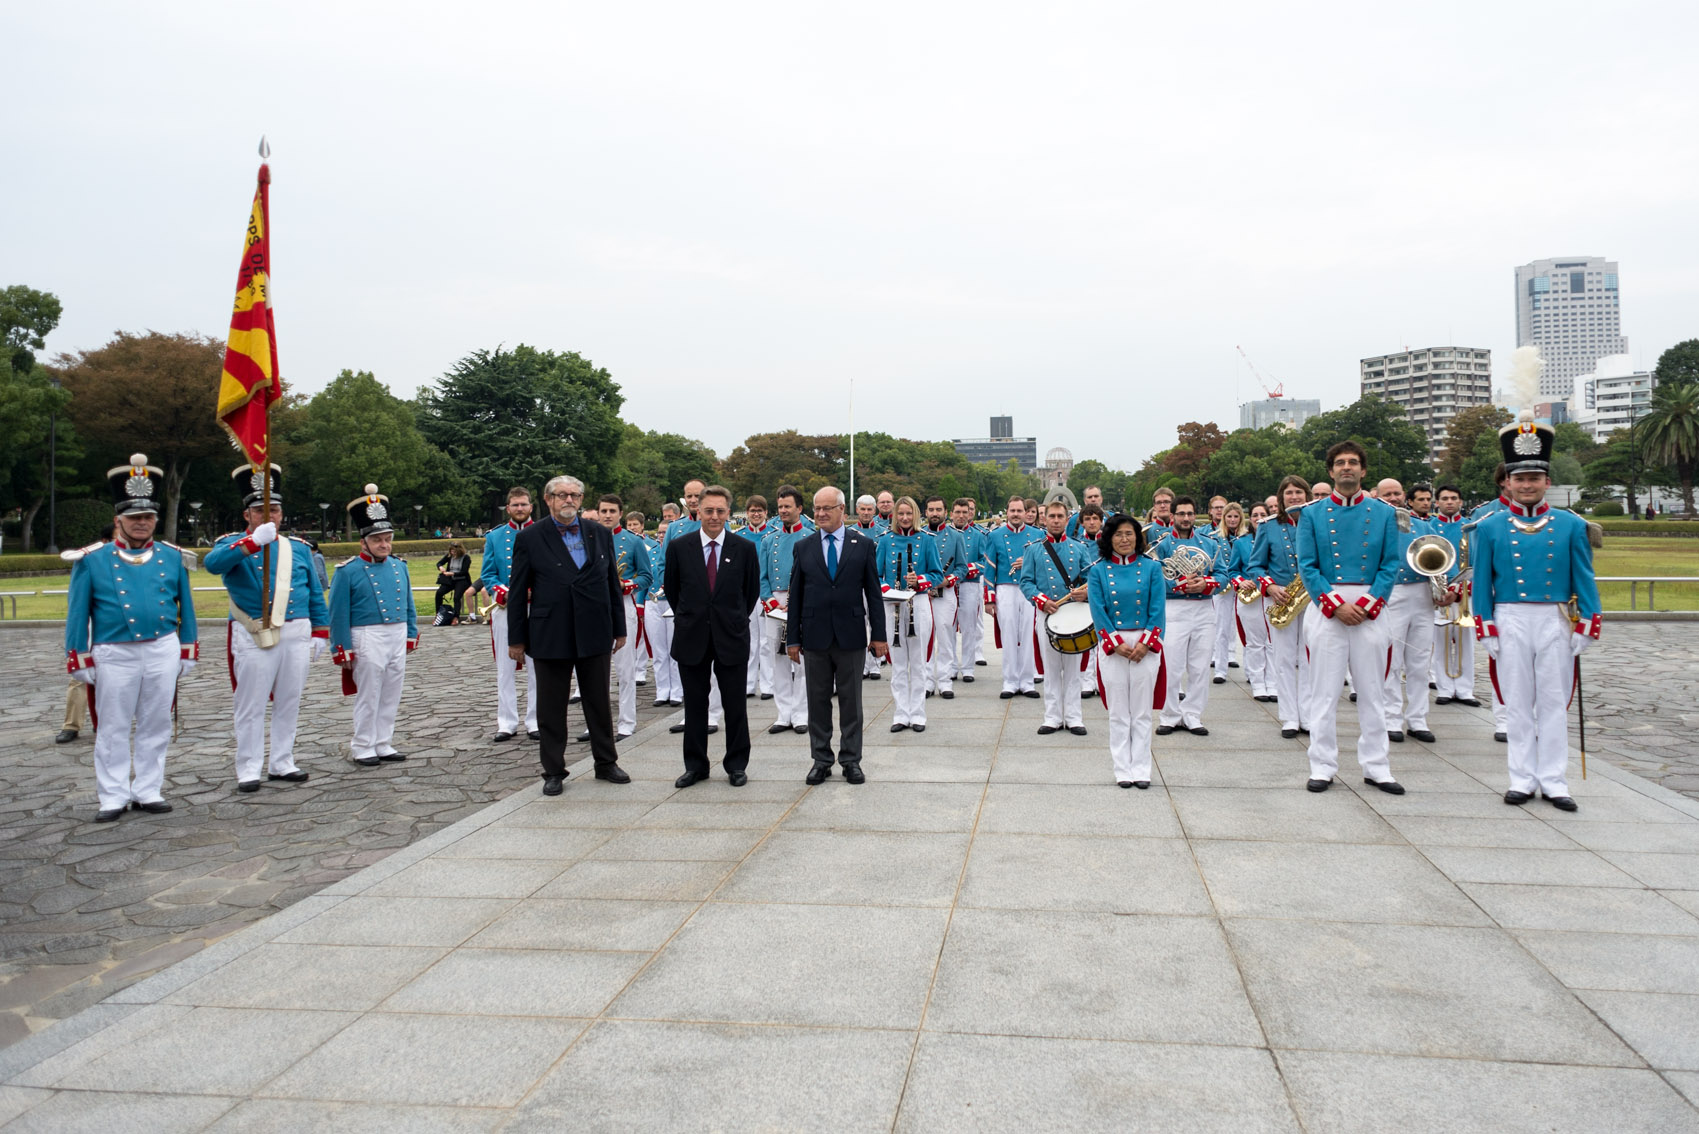 2014-10-21_Ceremonie-Hiroshima_35